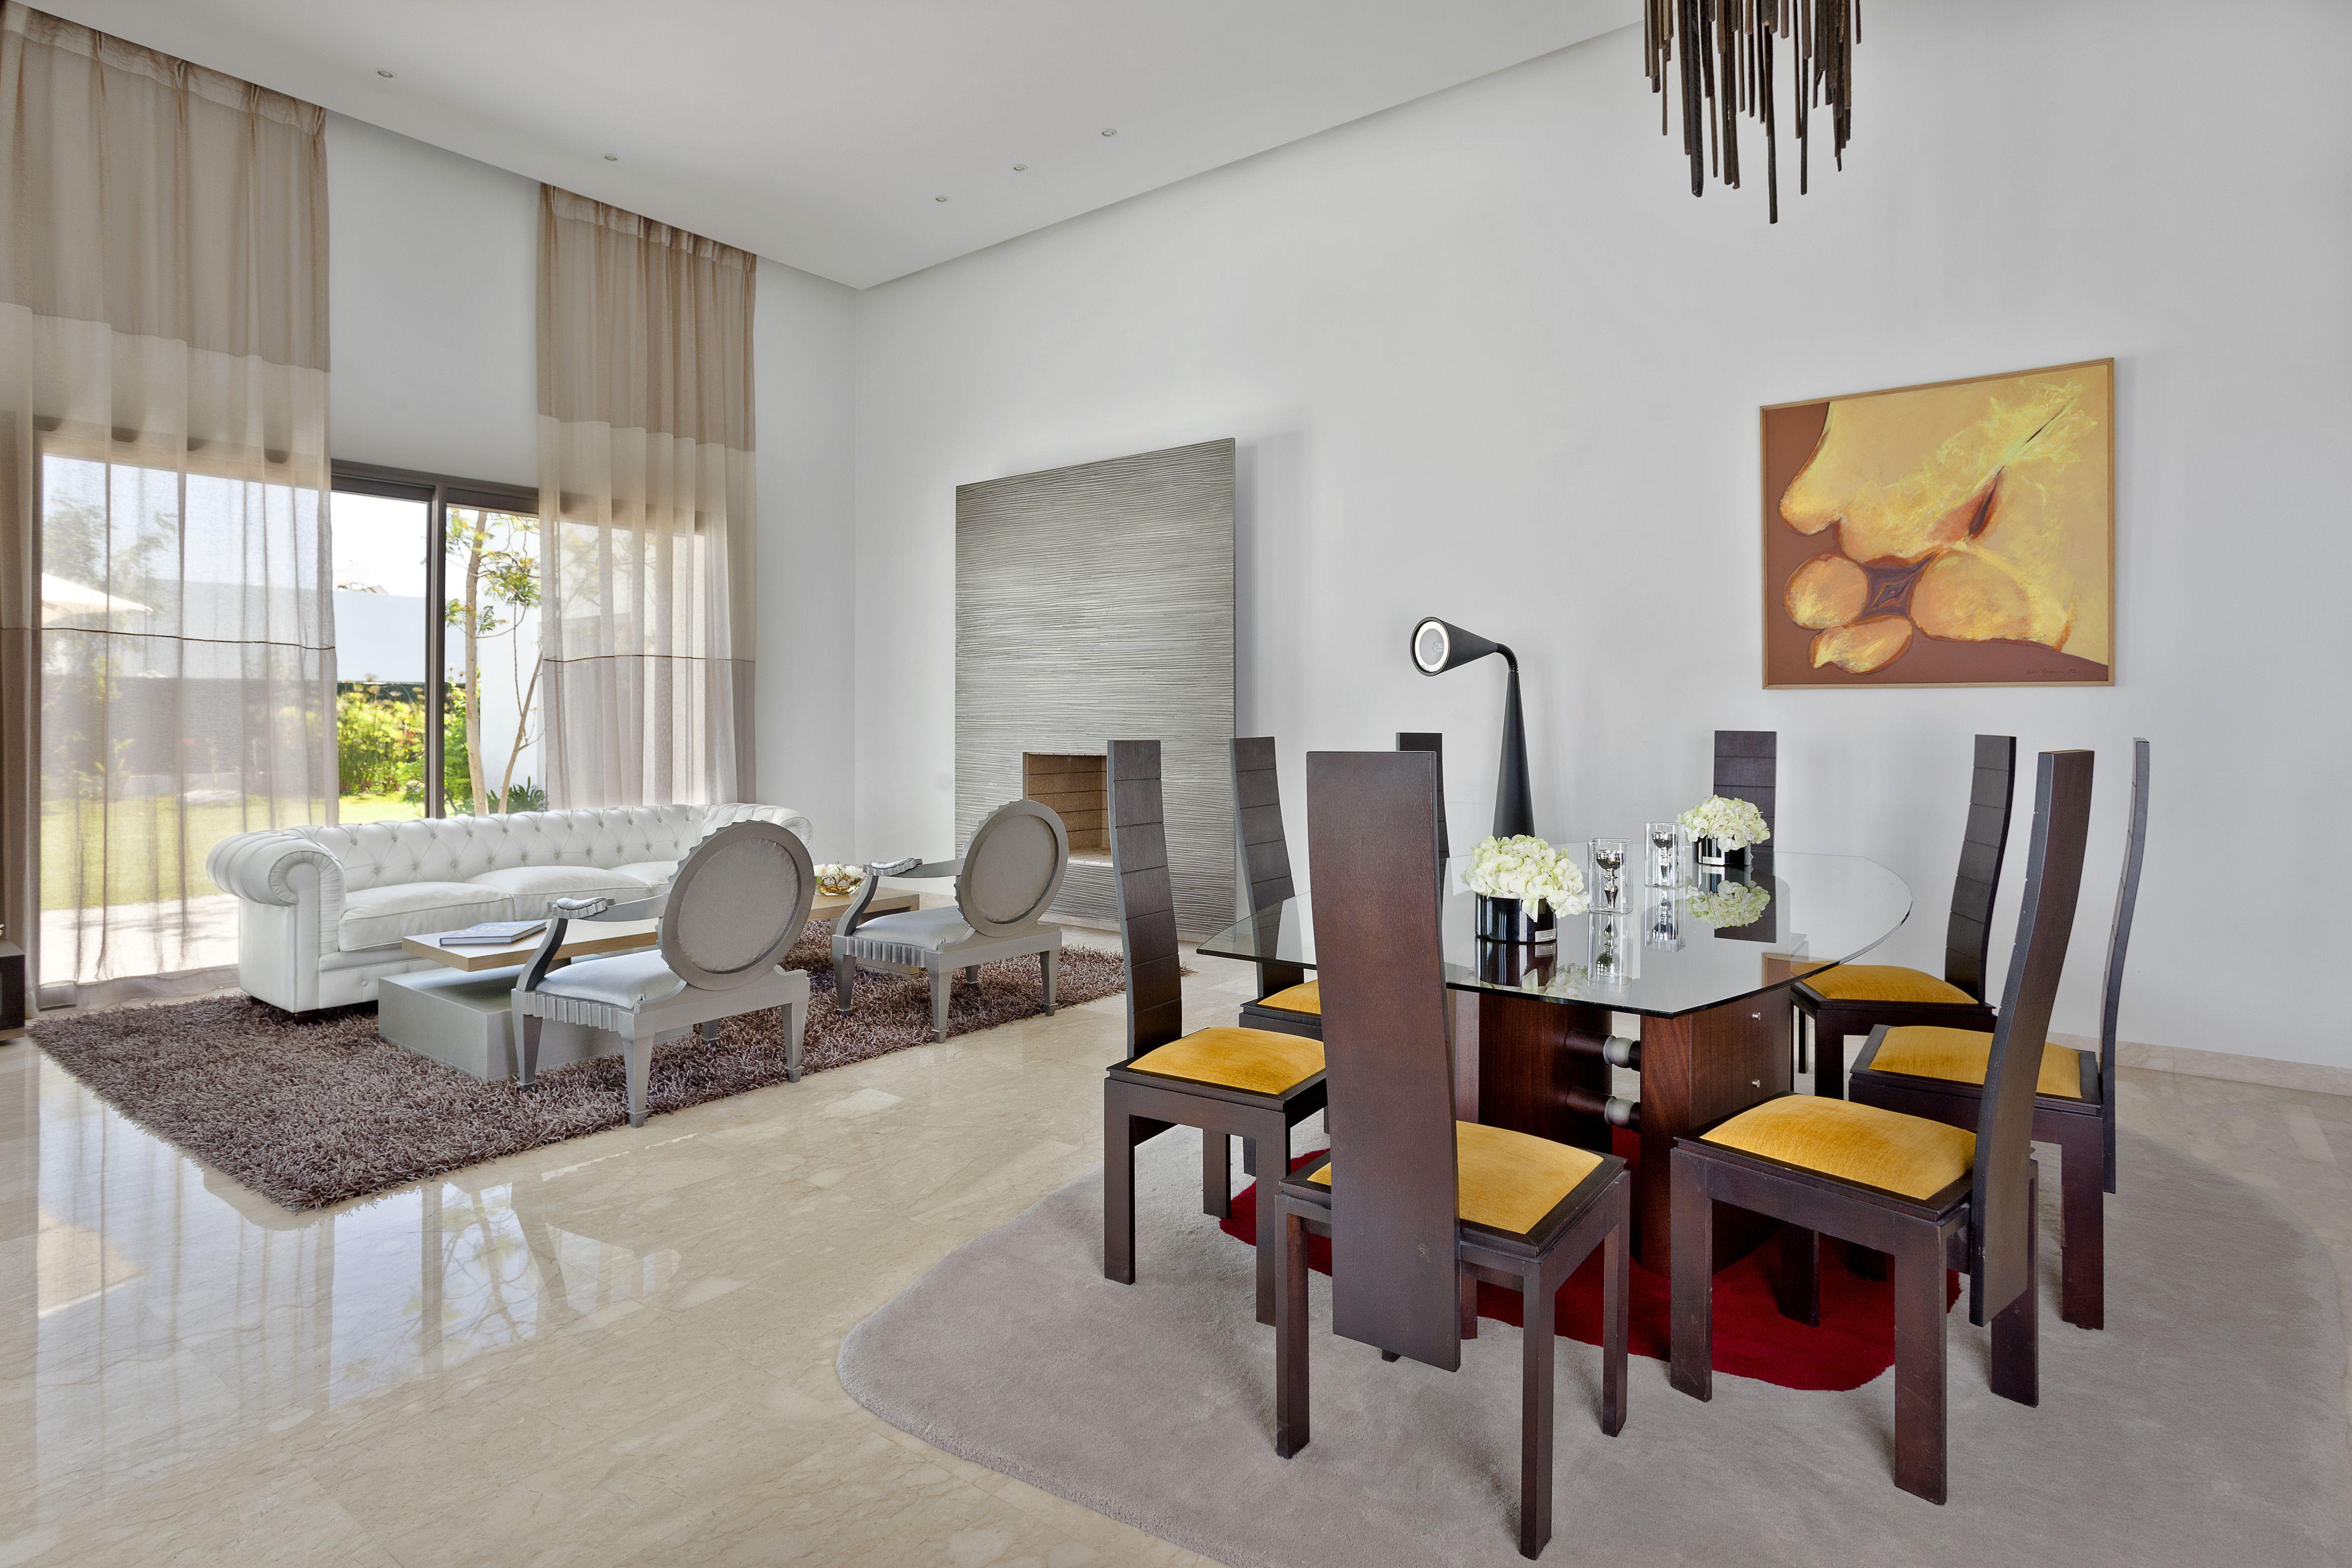 espace dacceuil casadiaa immobilier de luxe villa piscine